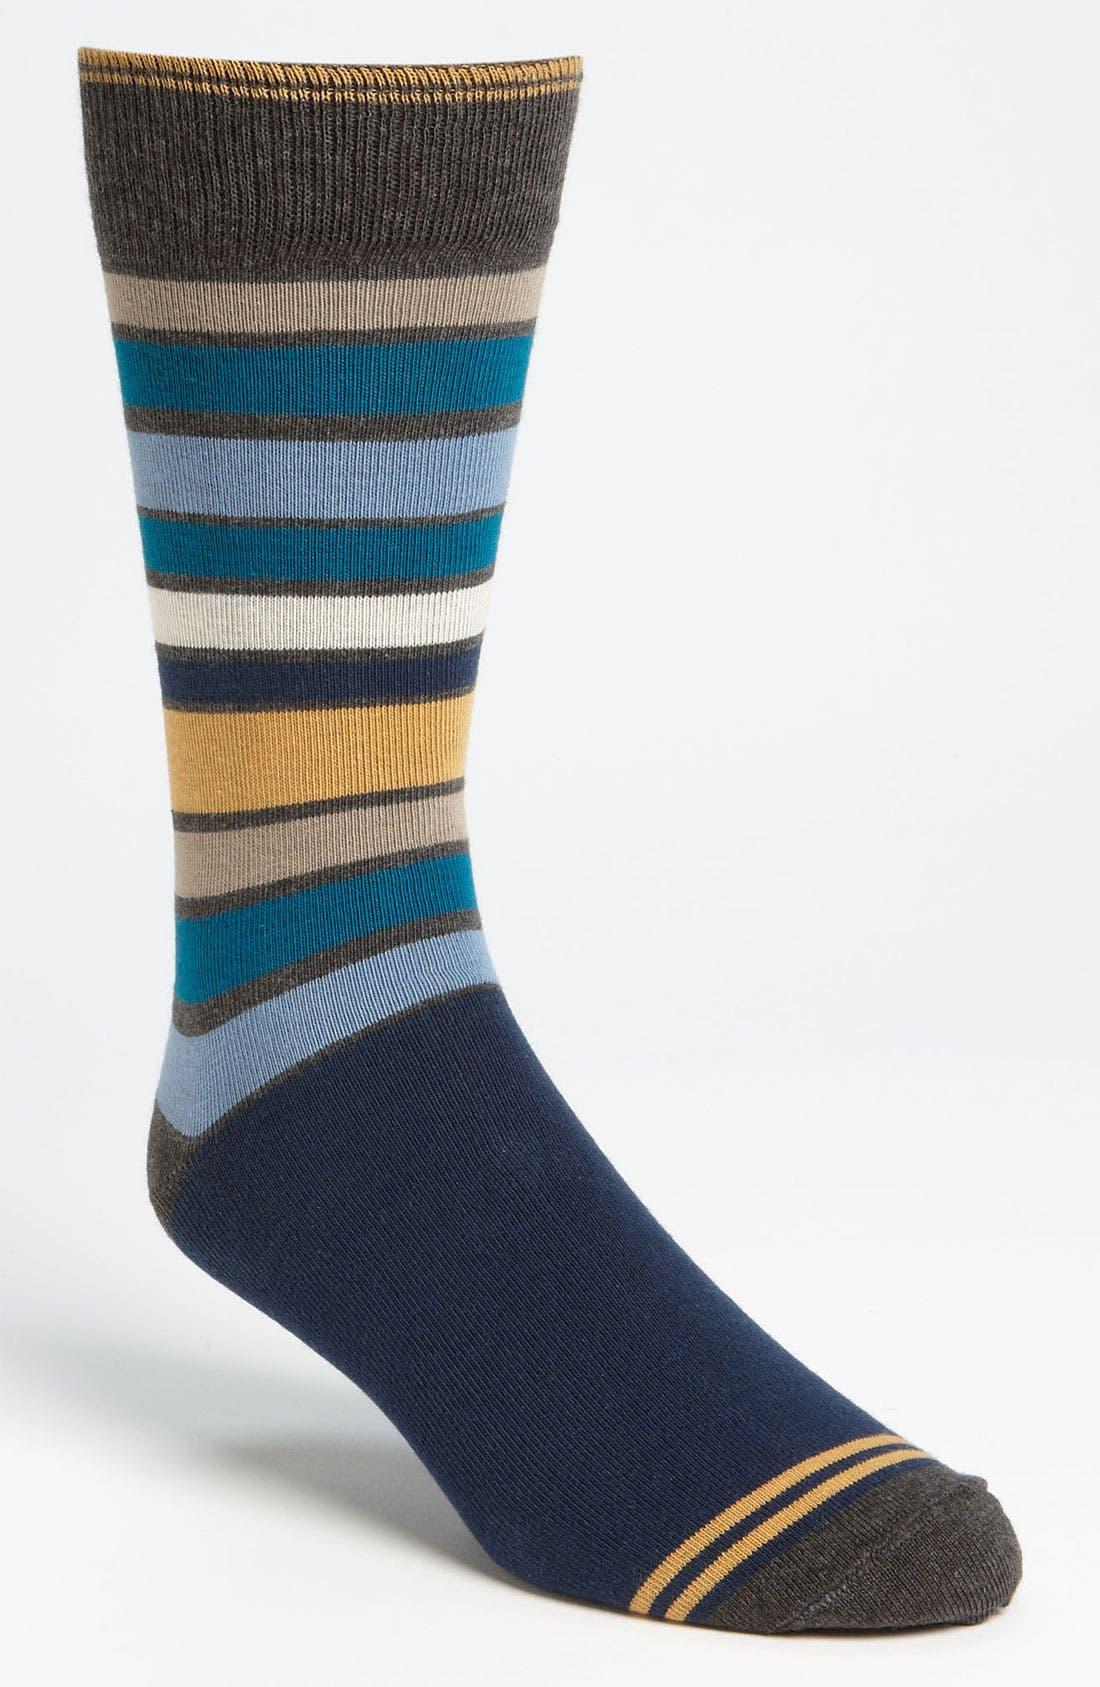 Main Image - Pact 'Blues' Socks